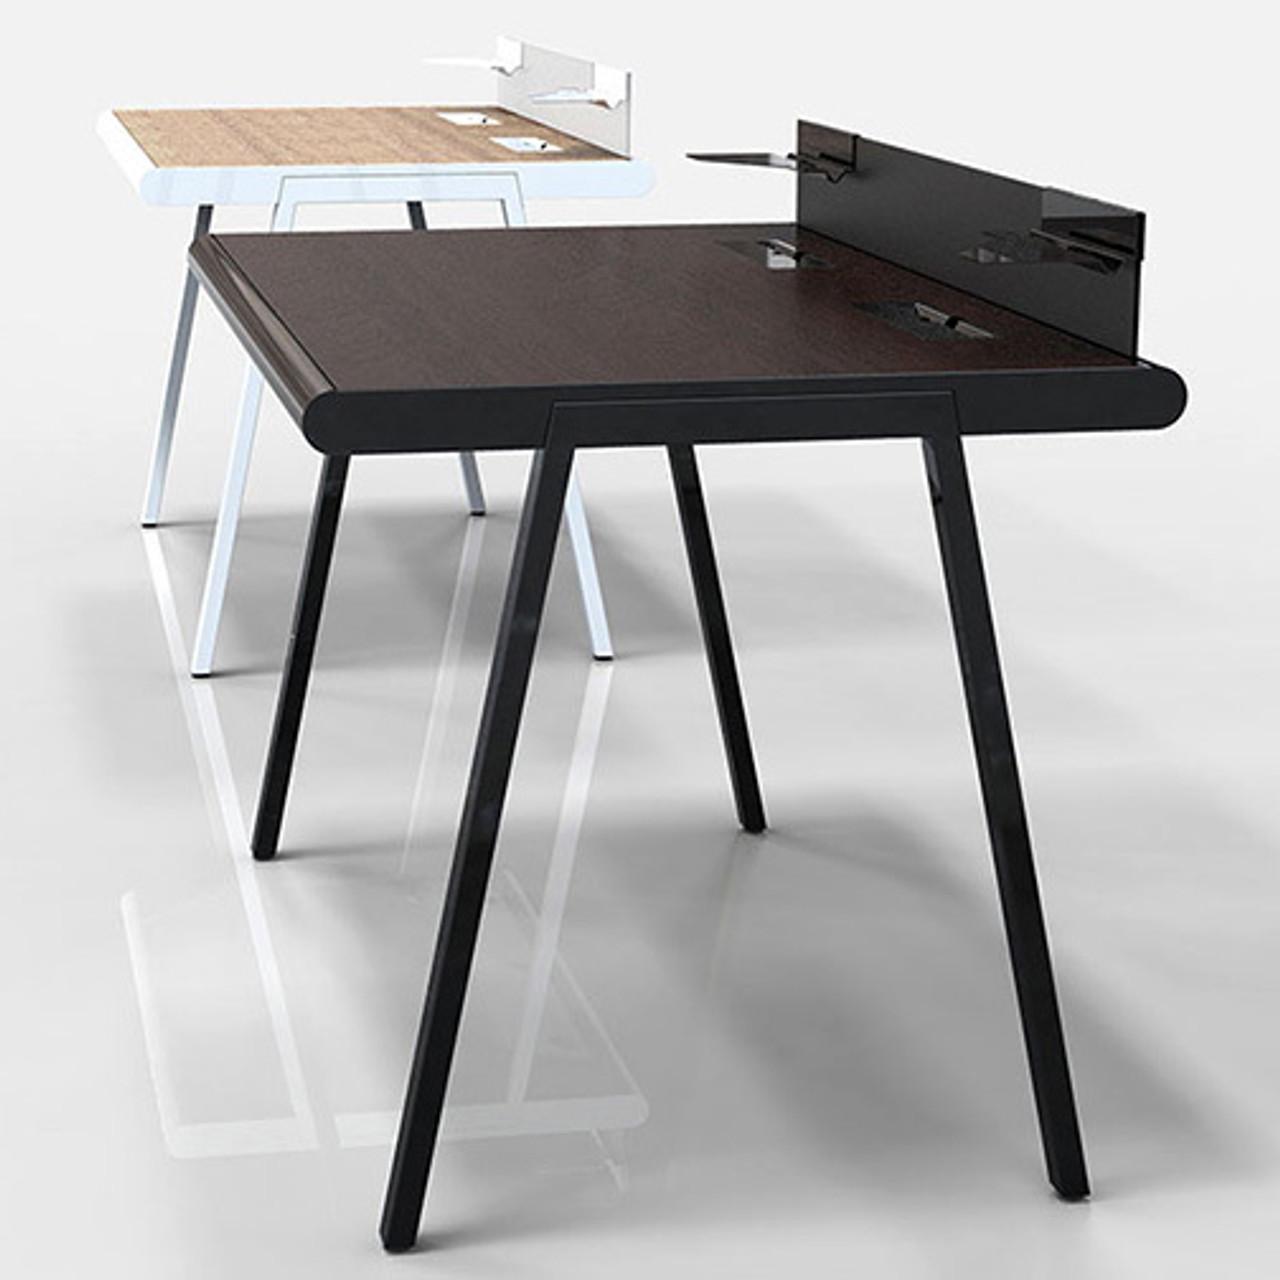 Peter Pepper NIK Desks